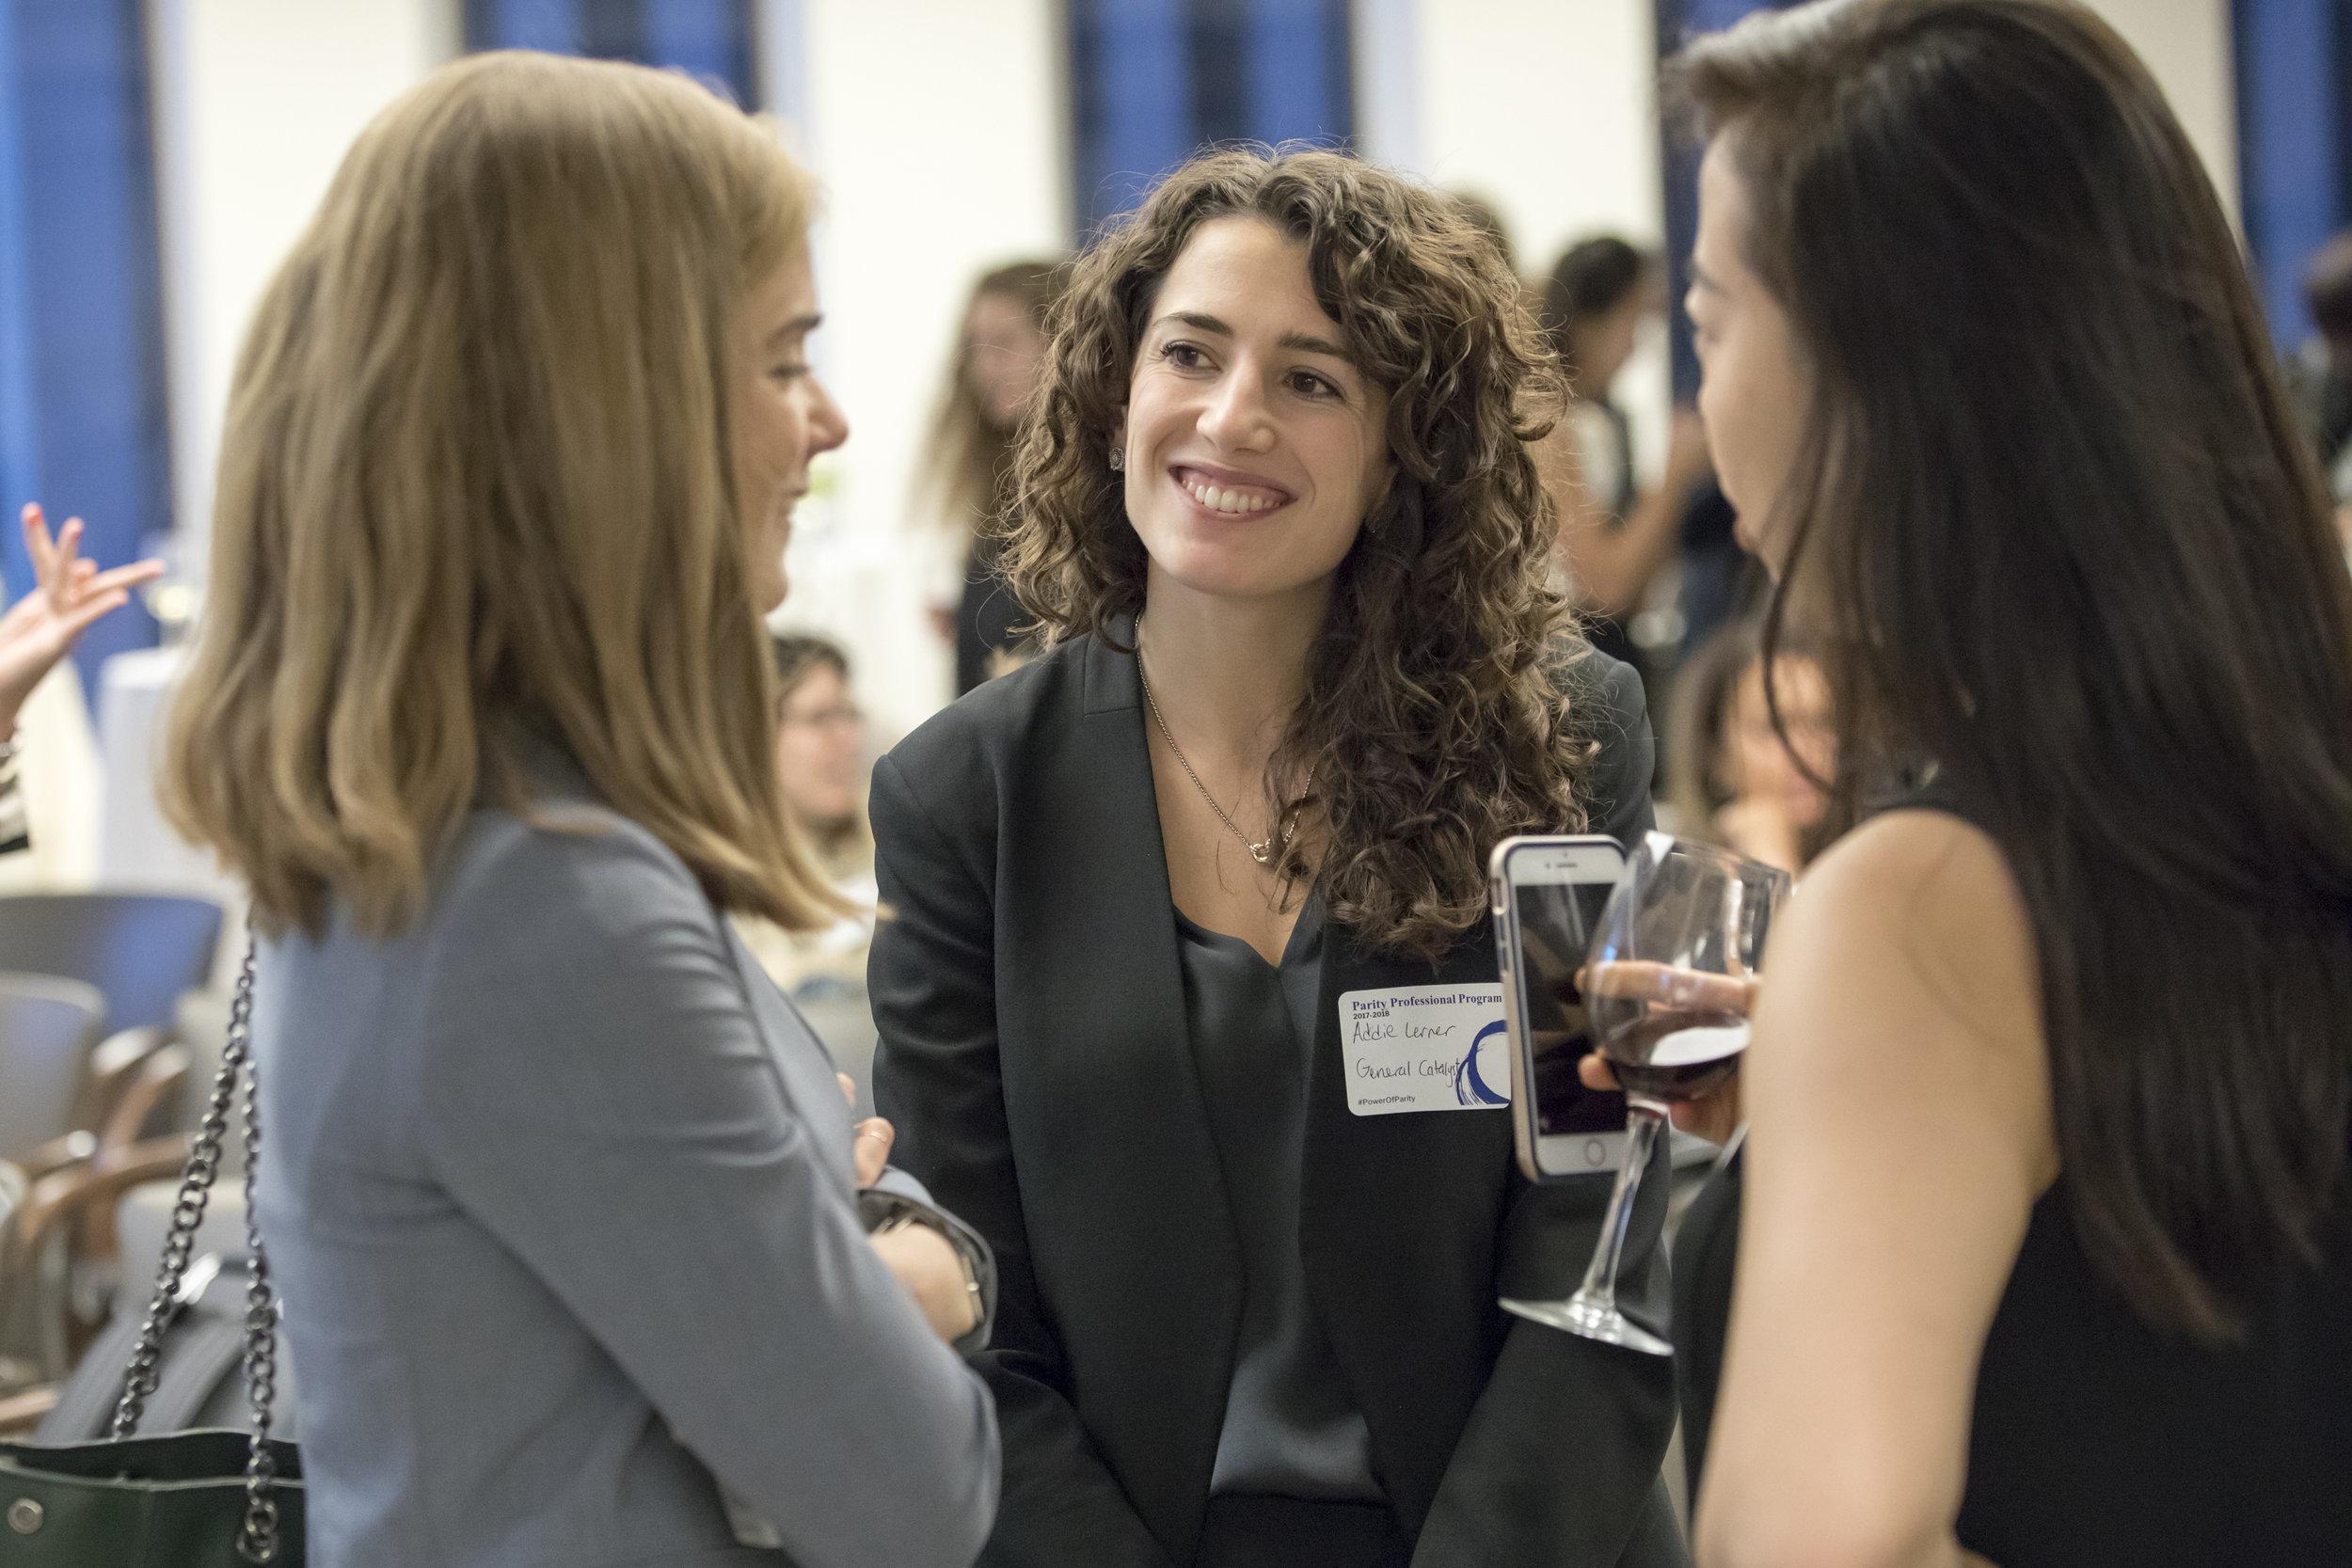 Addie Lerner (center), Principal at General Catalyst